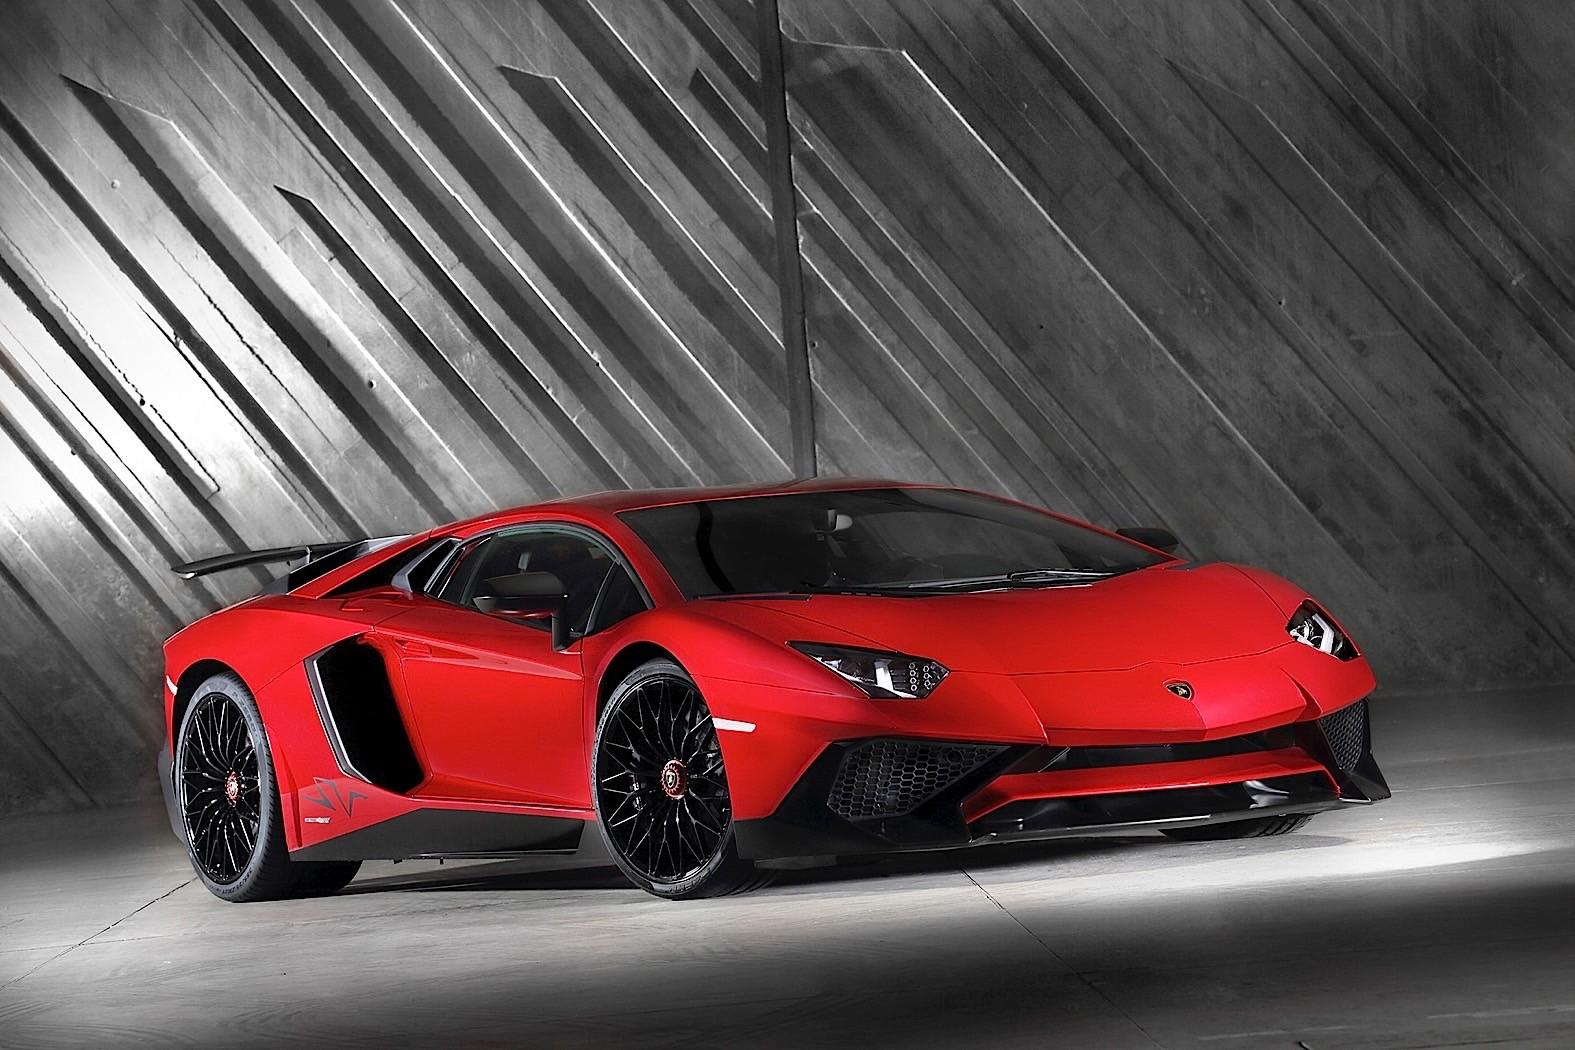 2017 Lamborghini Aventador LP 750 4 Superveloce Review